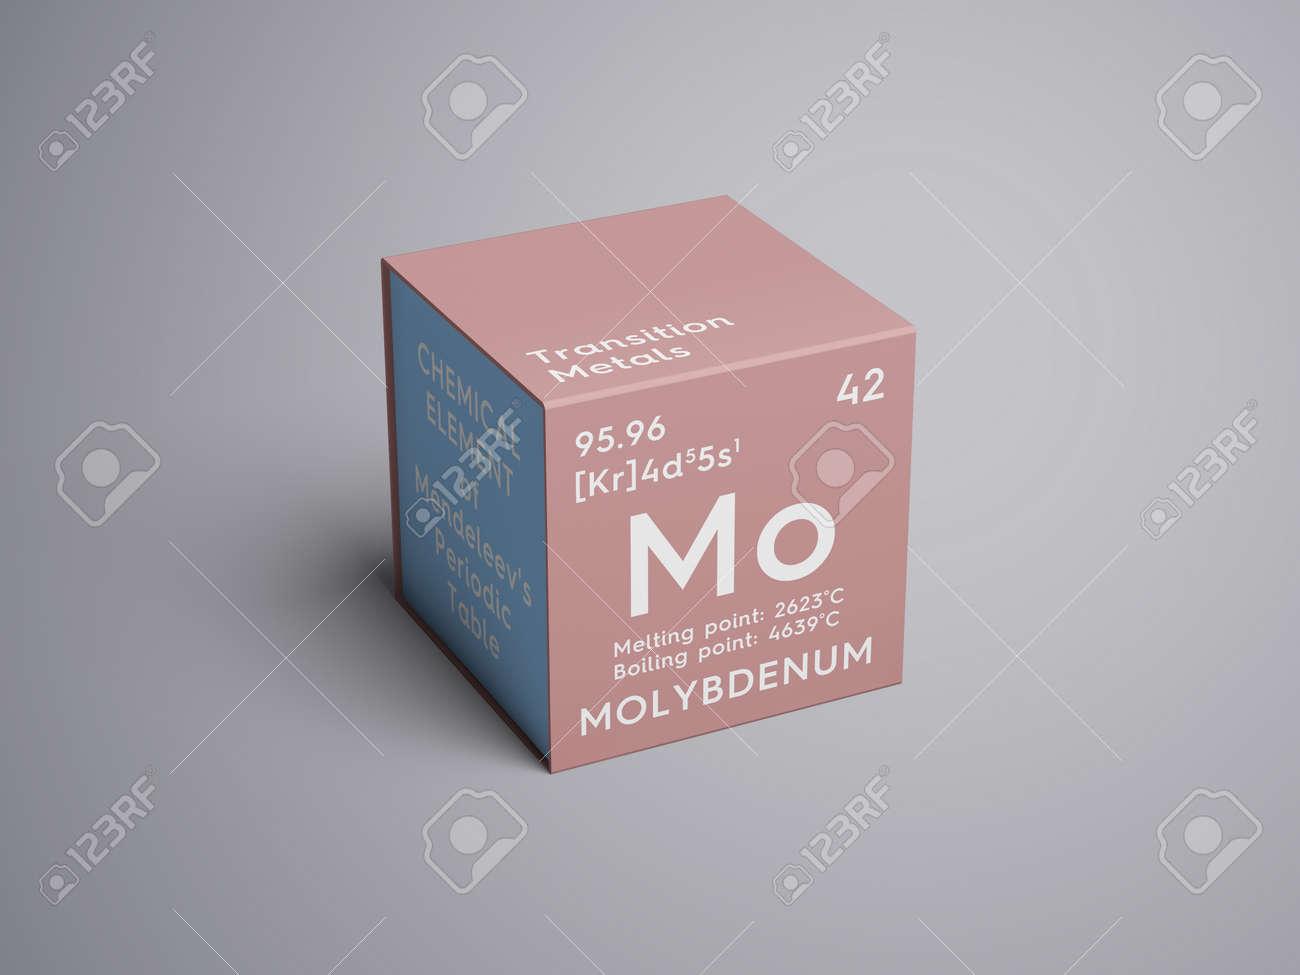 How did mendeleev arrange the elements in his periodic table image how did mendeleev arrange the first periodic table choice image how did mendeleev arrange the elements gamestrikefo Image collections